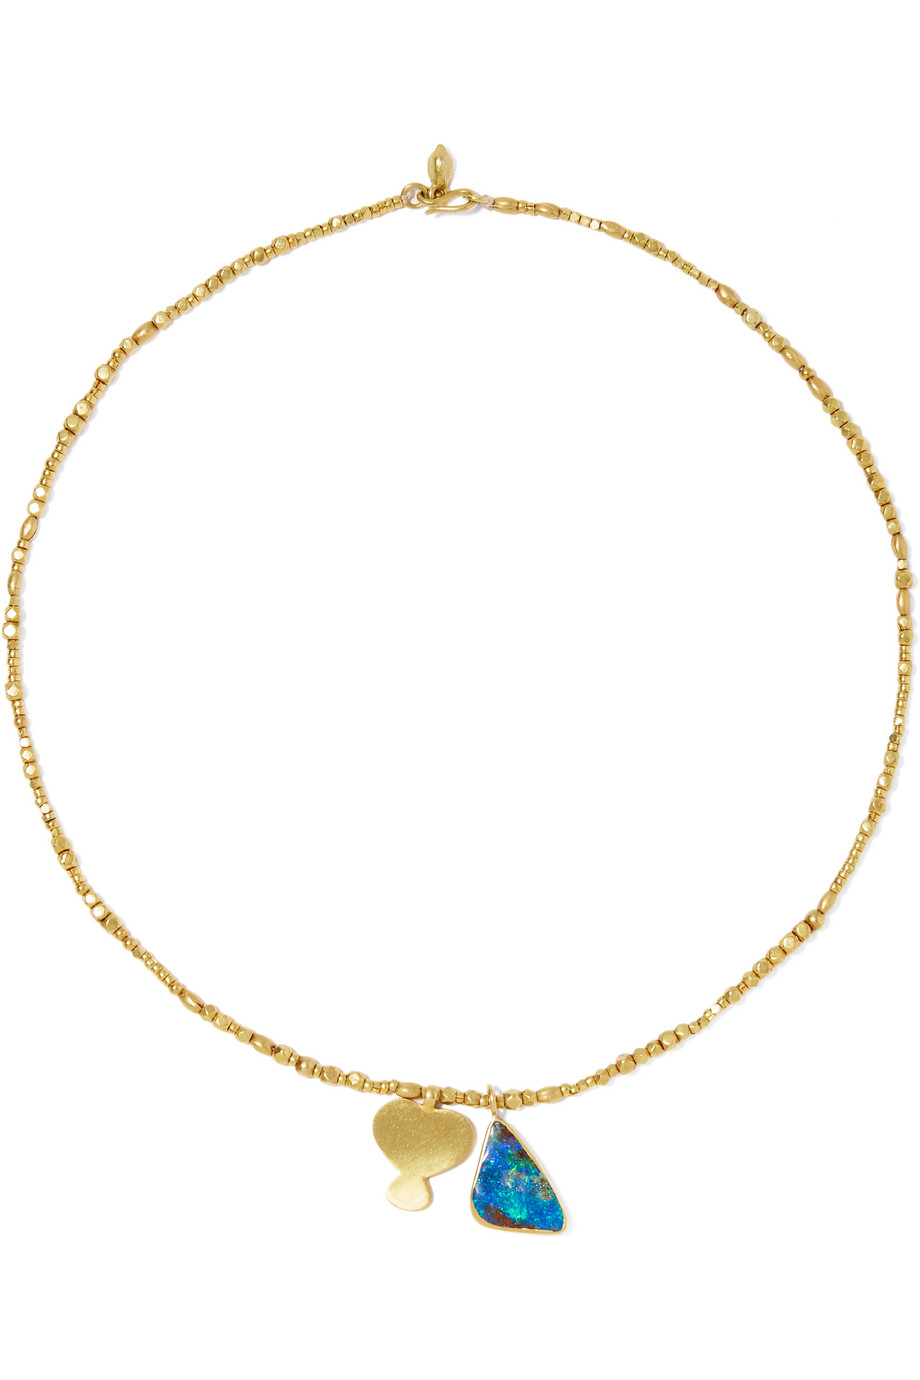 Pippa Small 18-Karat Gold Opal Necklace, Gold/Blue, Women's